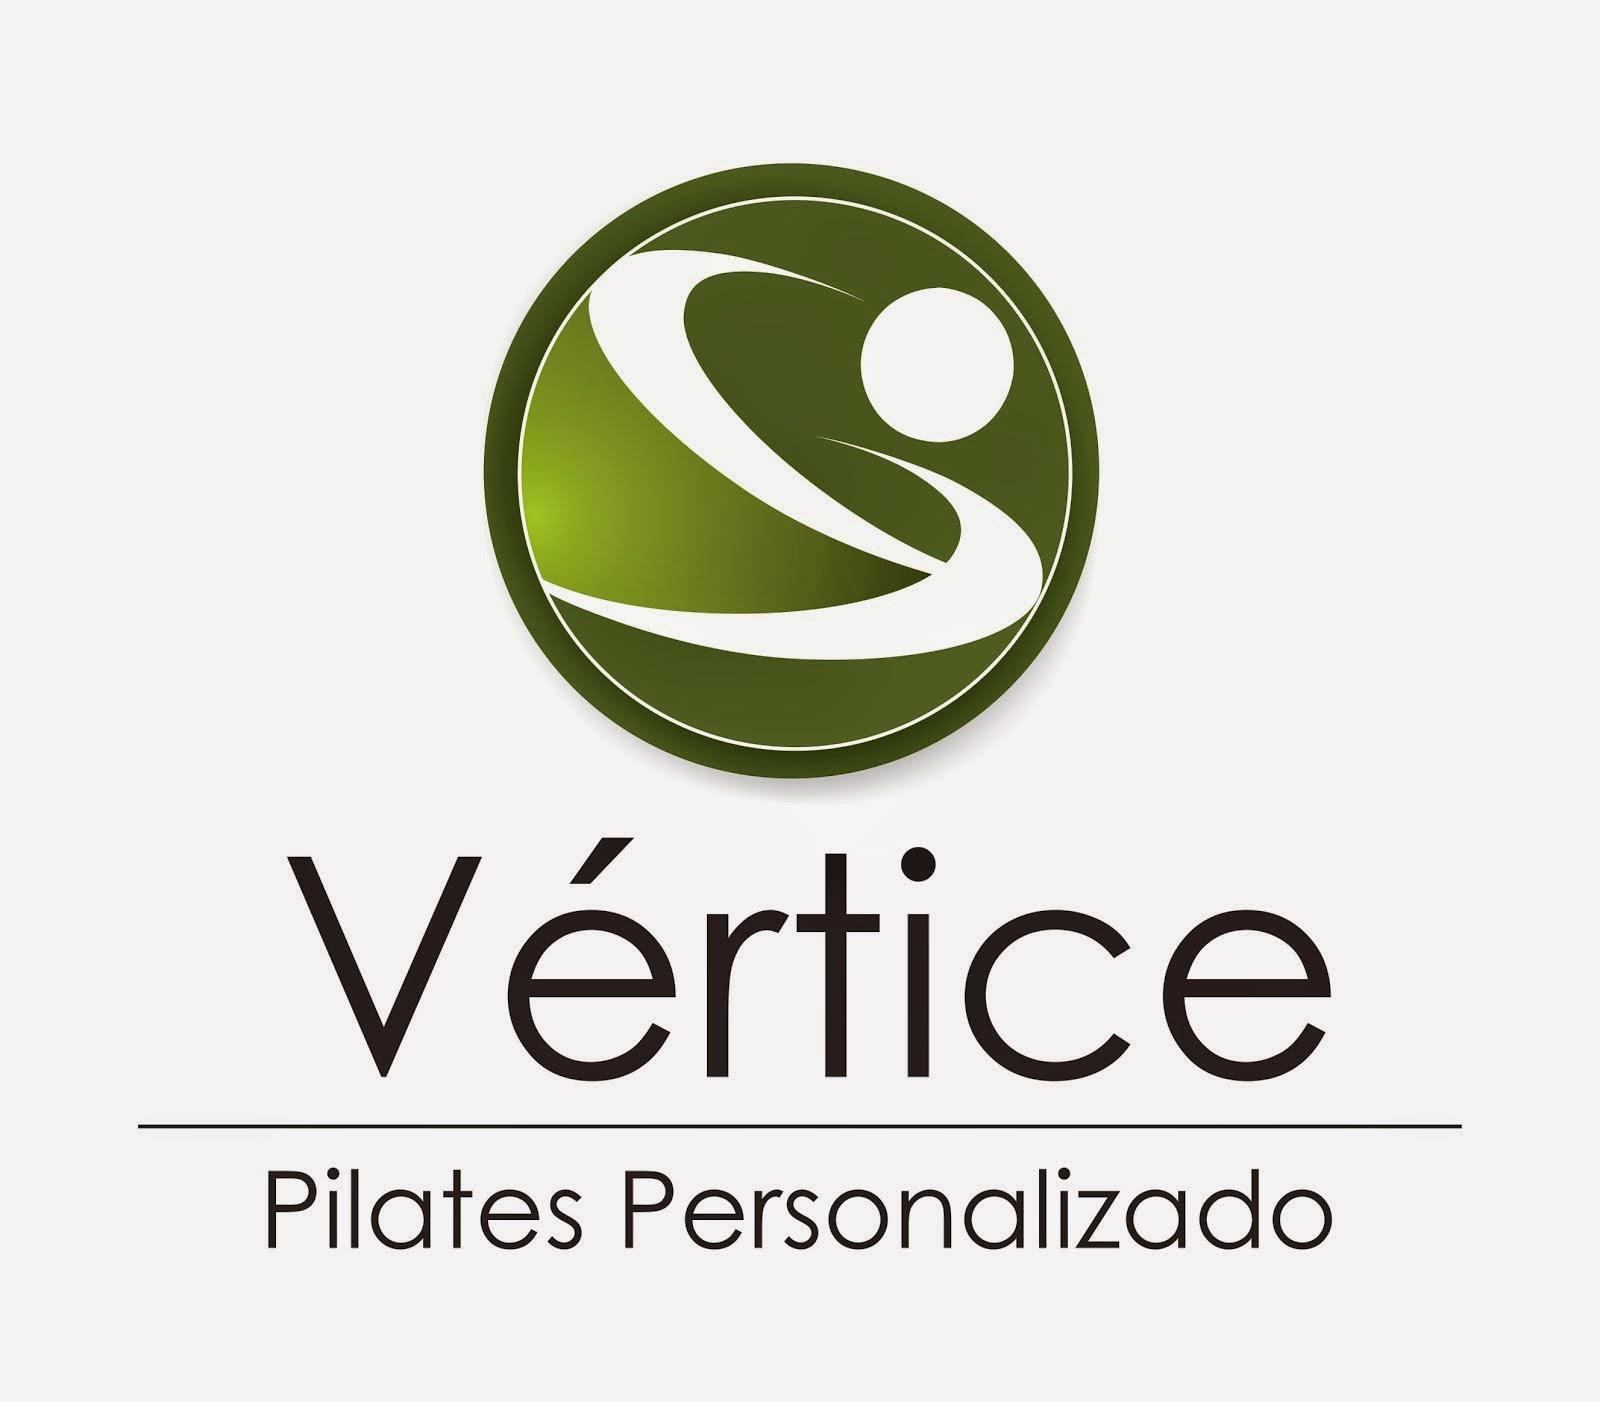 Vértice Pilates